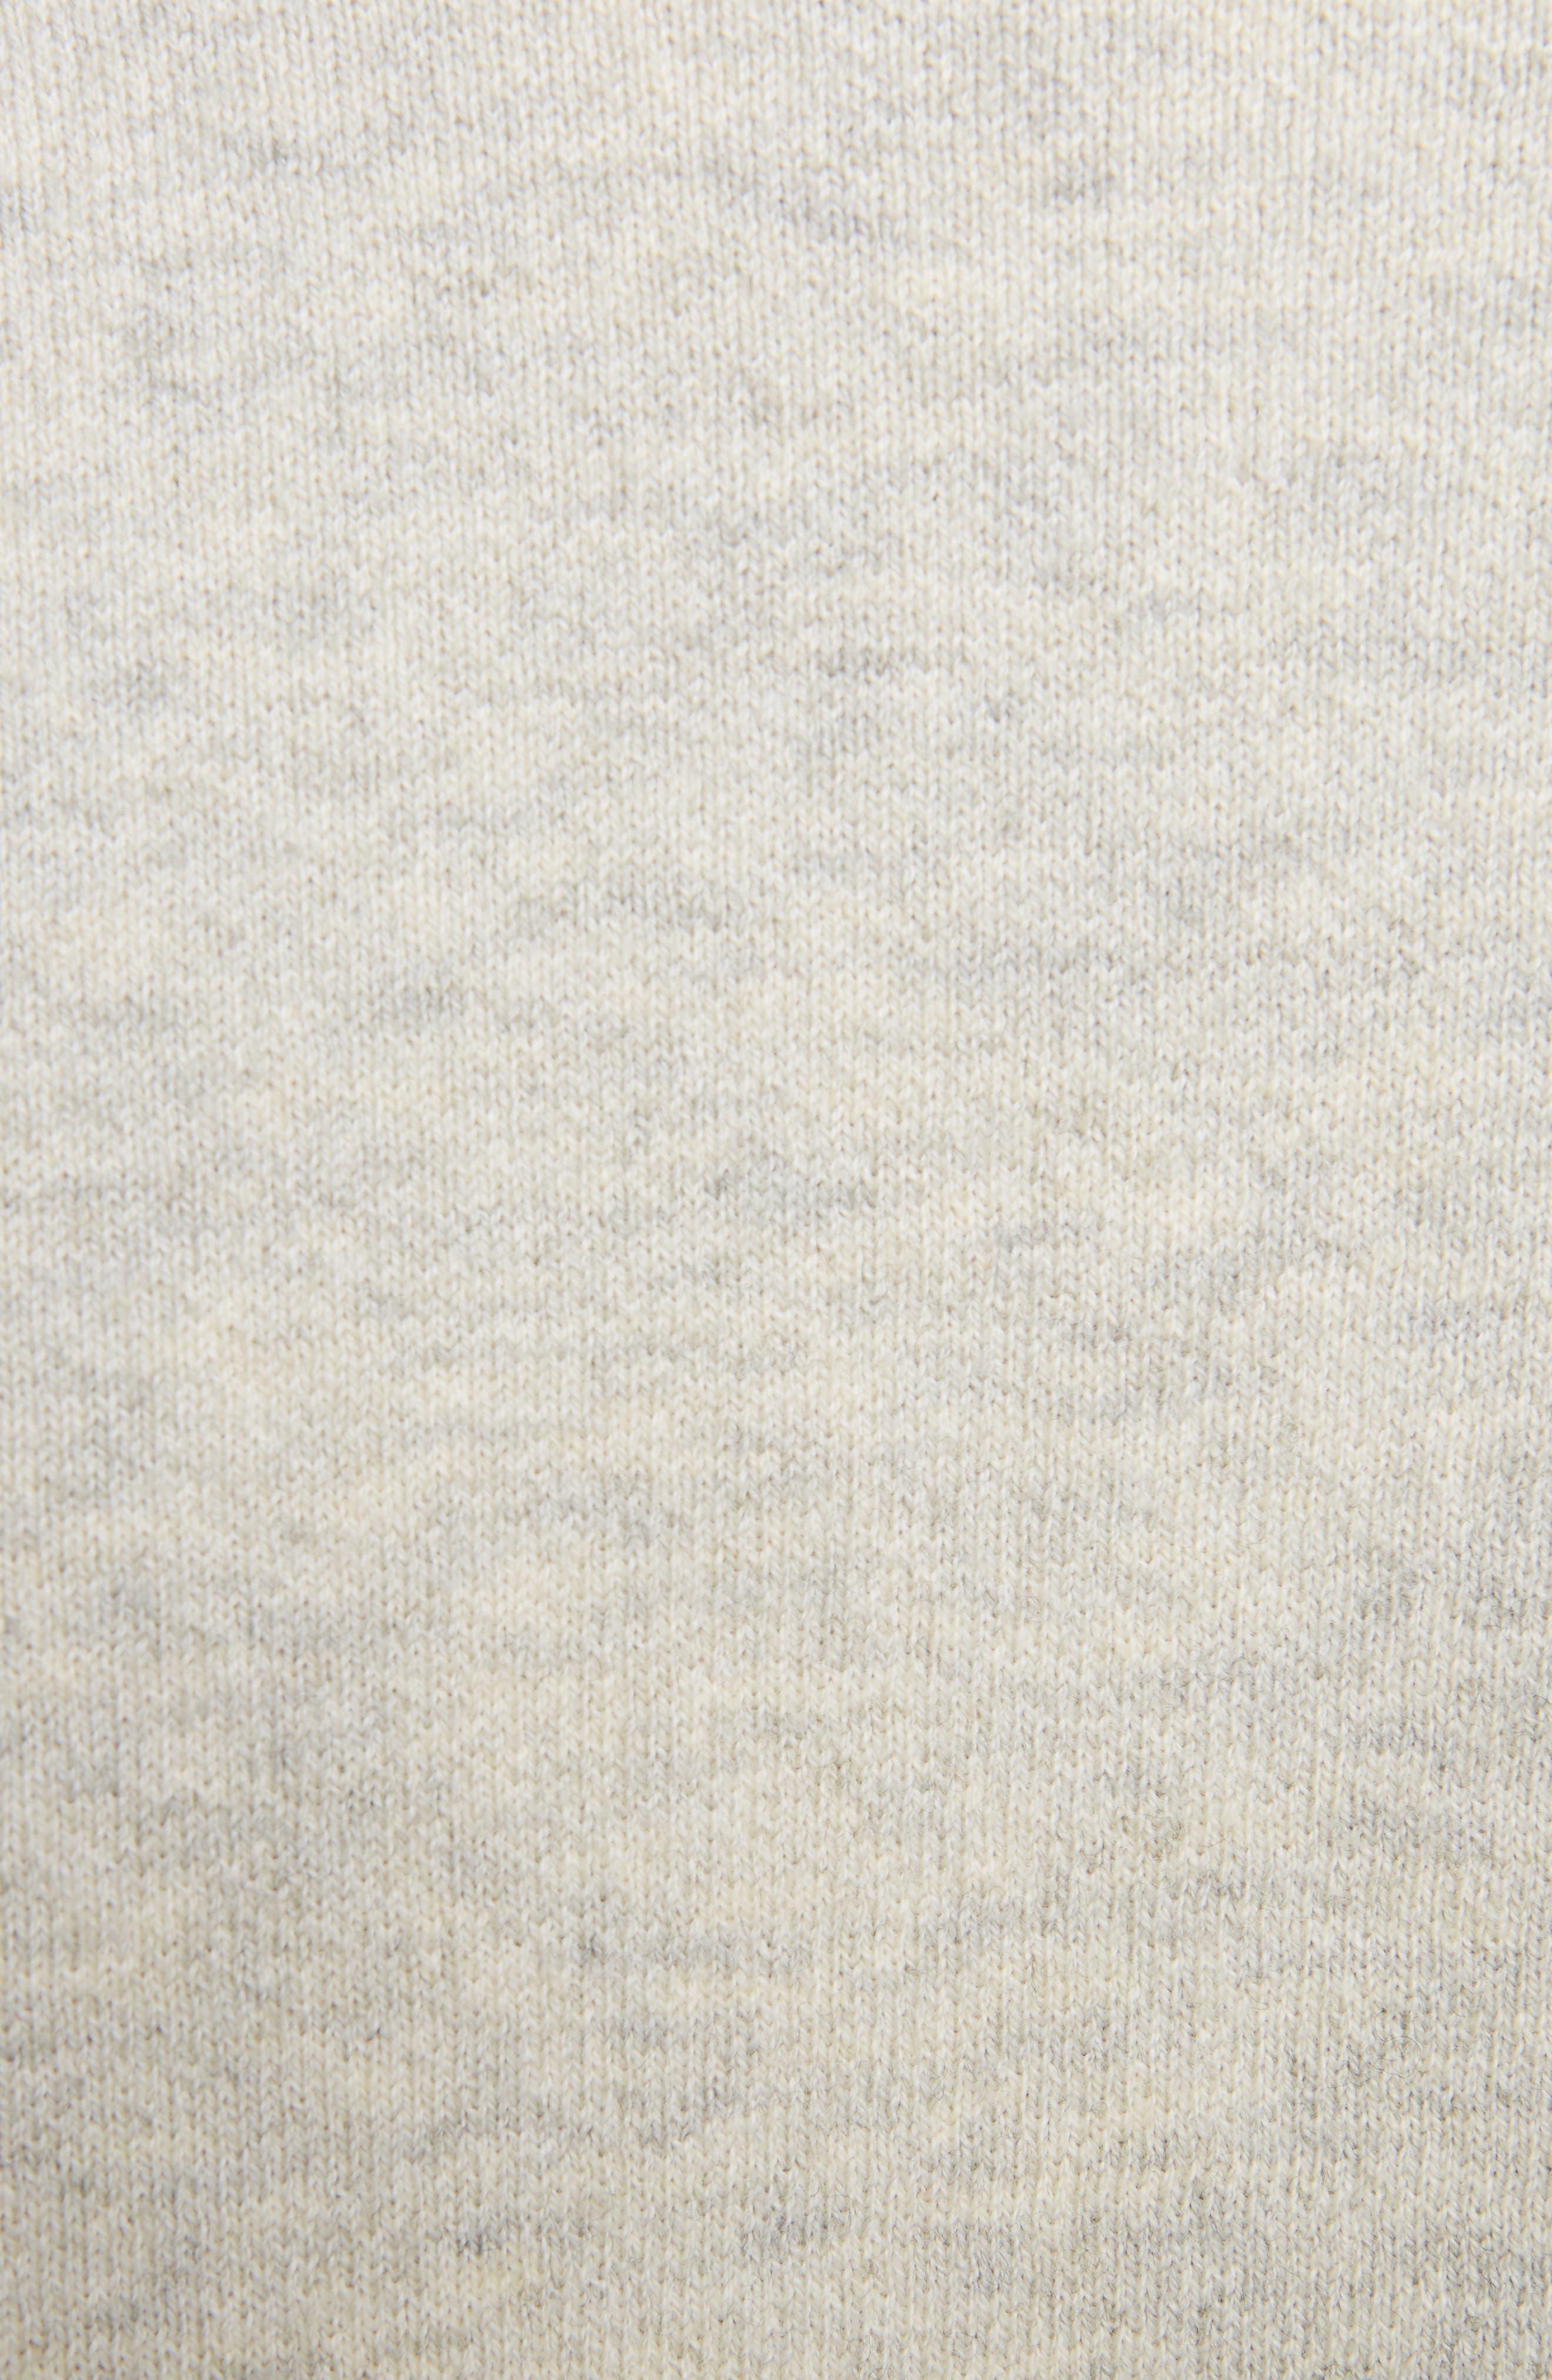 Isabel Marant Étoile Kao Sweatshirt,                             Alternate thumbnail 5, color,                             Light Grey